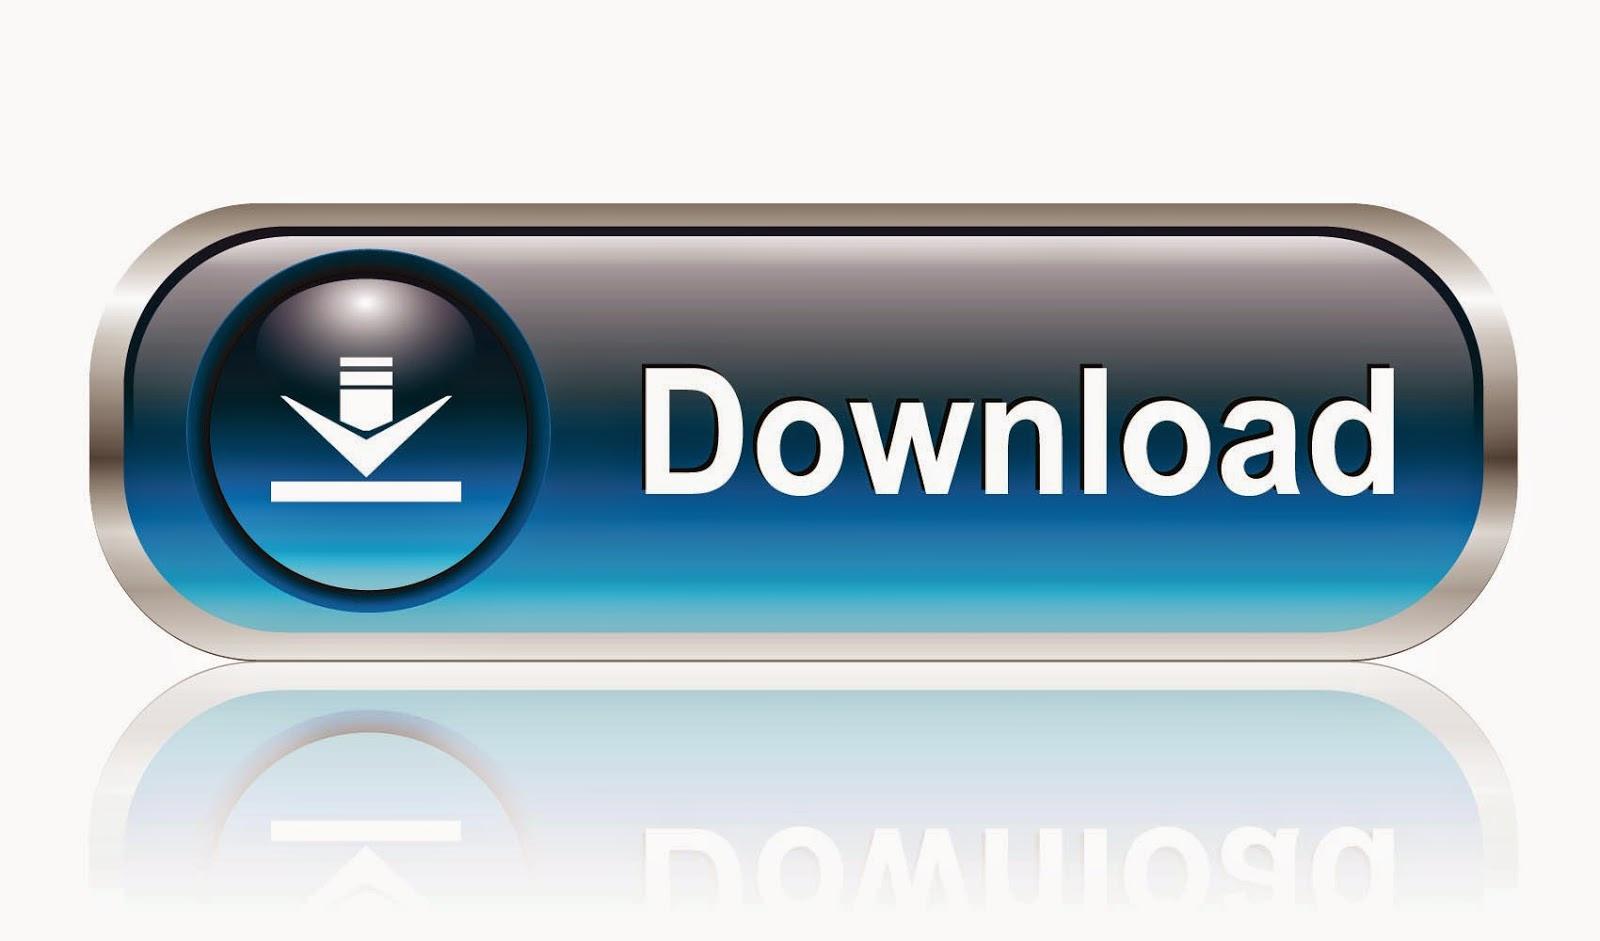 "<img src=""http://1.bp.blogspot.com/-LmdQZIYoSJ4/U1dqOHhuMFI/AAAAAAAACas/jR9GVuM87IY/s1600/hardwipe.png"" alt=""Hardwipe Portable 4.0.2 Free Download"" />"